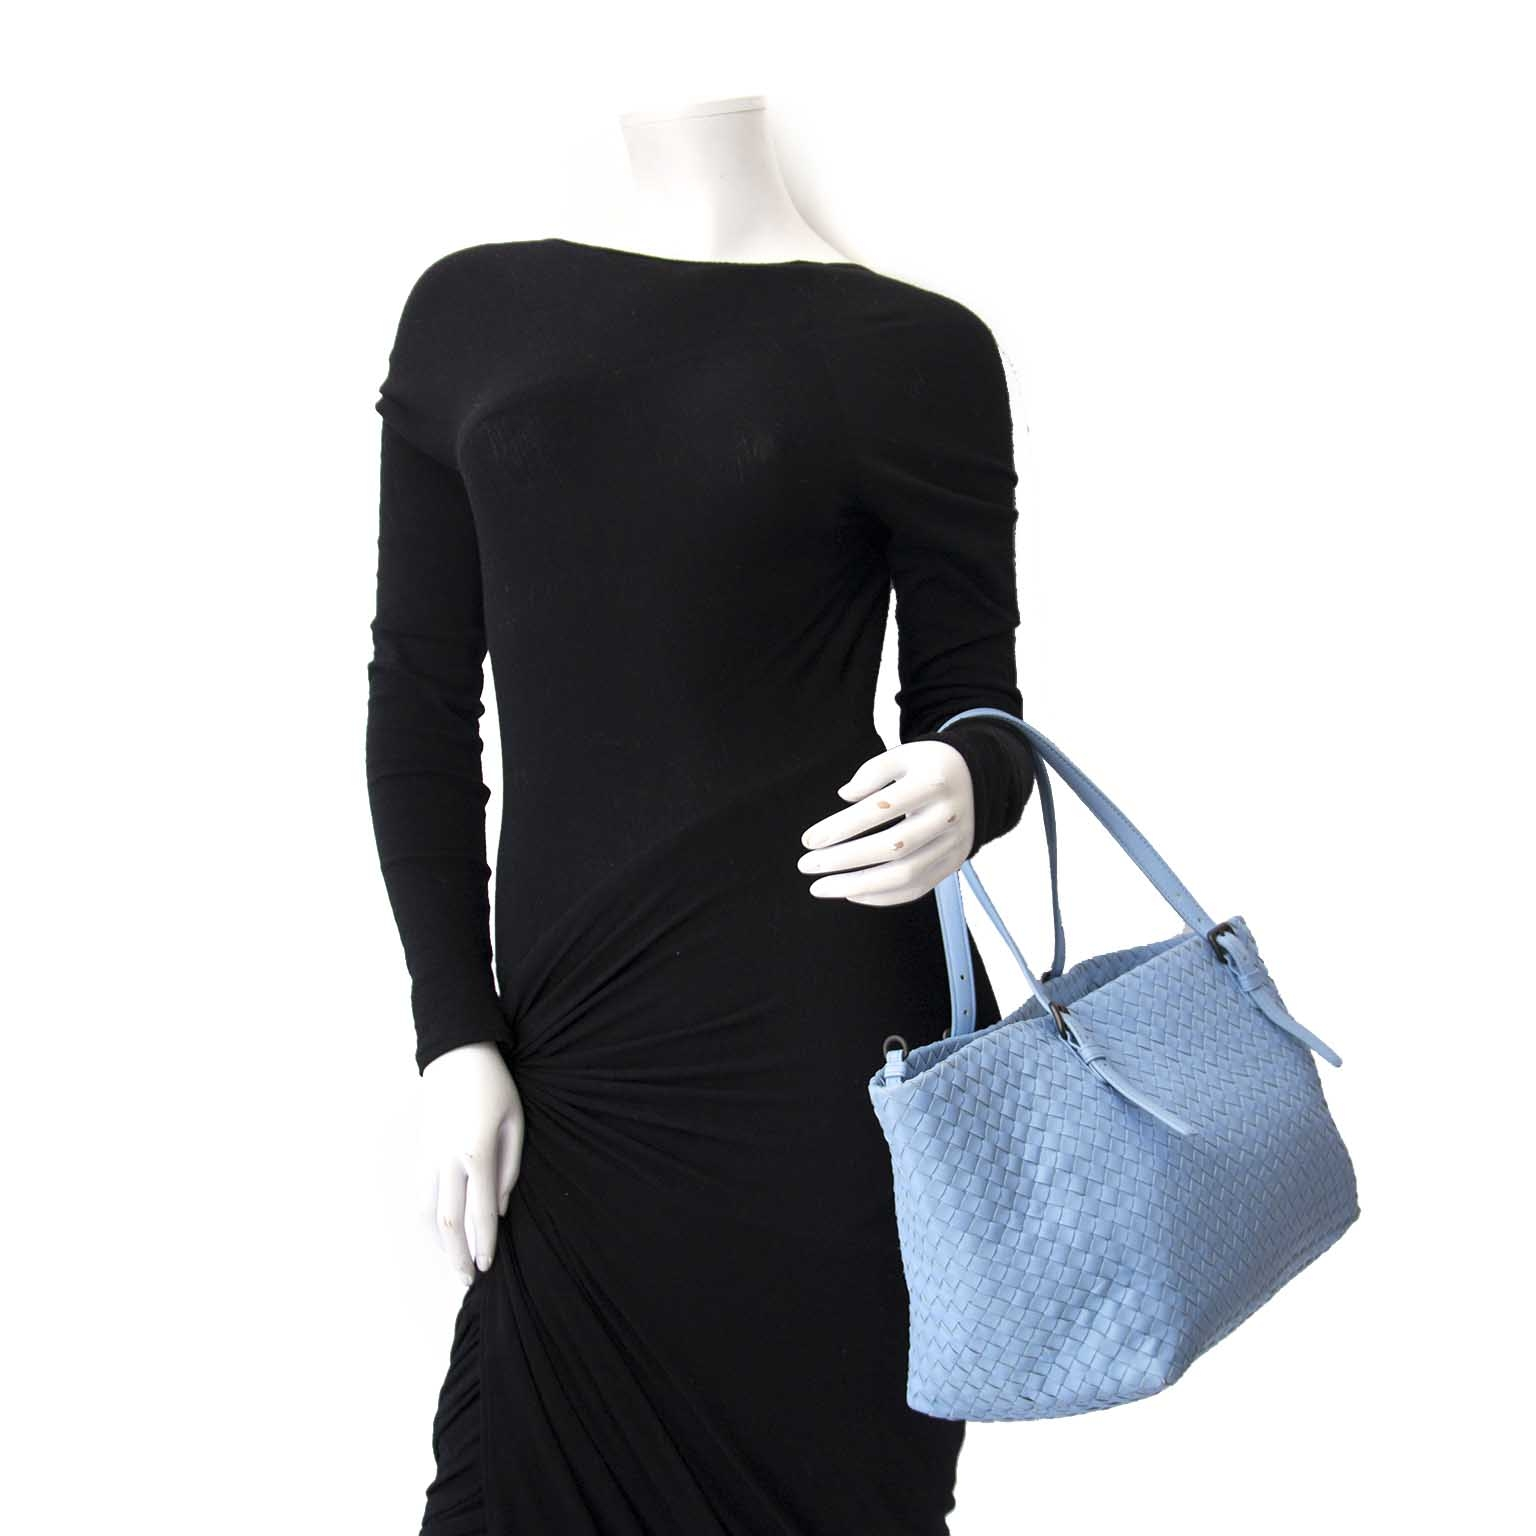 Bottega Veneta Light Blue Shopper  cesta Buy authentic designer Bottega Veneta secondhand bags at Labellov at the best price. Safe and secure shopping. Koop tweedehands authentieke Bottega Veneta tassen bij designer webwinkel labellov.